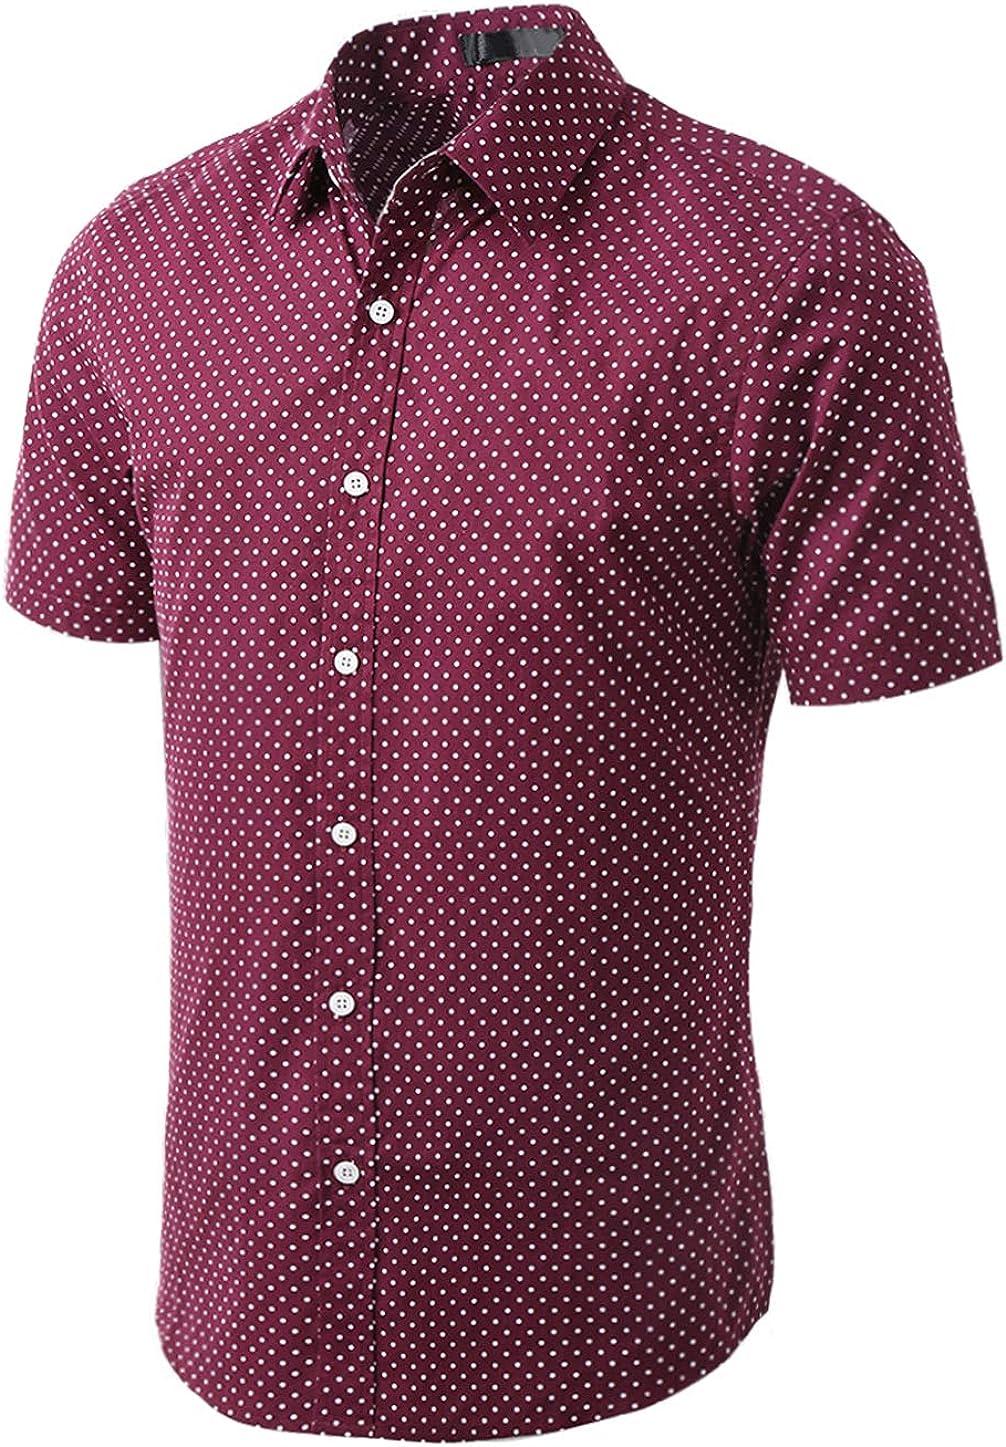 uxcell Men's Printed Cotton Dress Short Sleeves Polka Dots Button Down Shirt